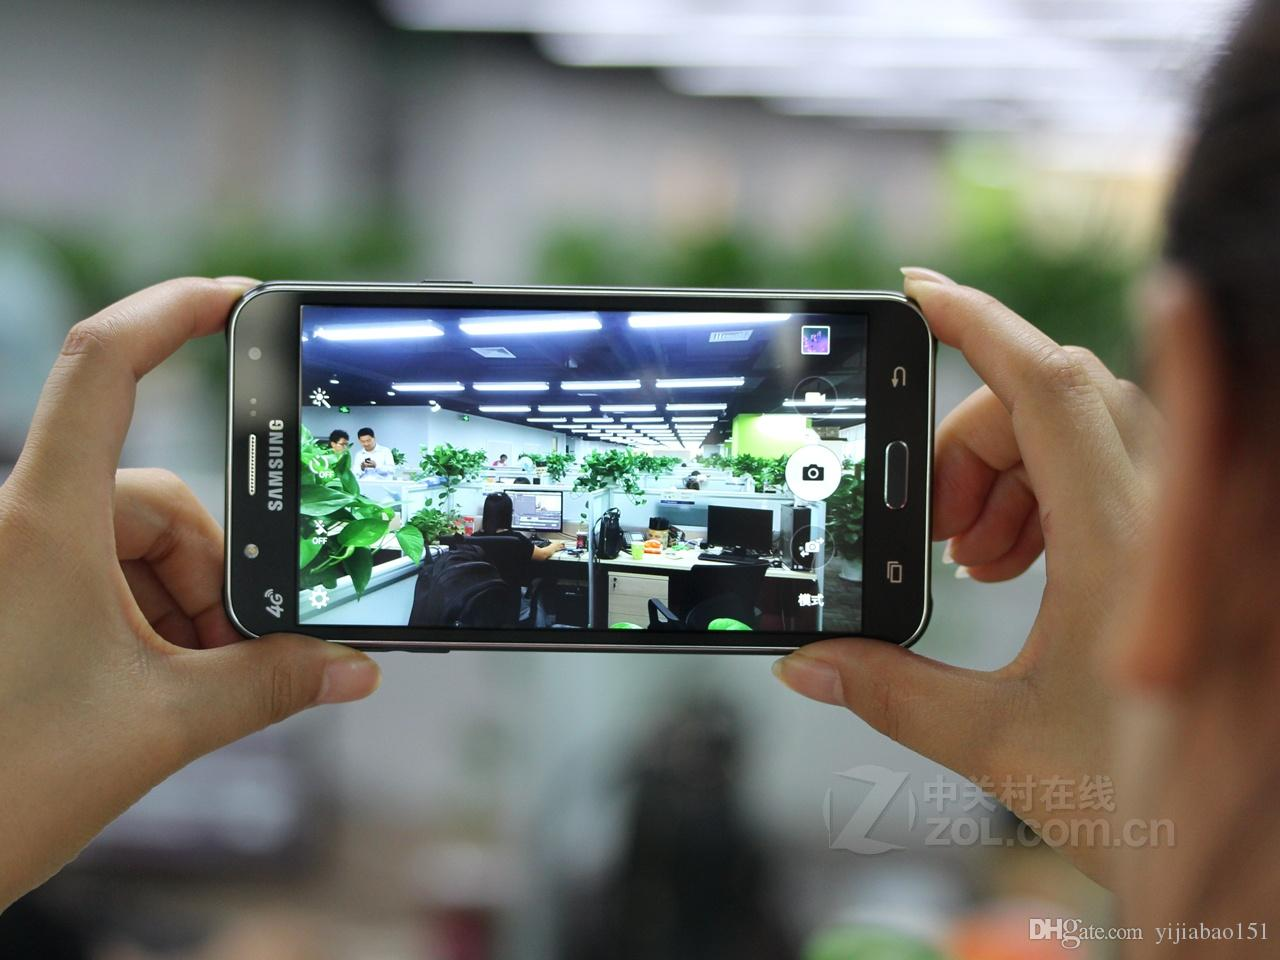 Yenilenmiş Orijinal Samsung Galaxy J7 J700F Çift SIM 5.5 inç LCD Ekran Octa Çekirdek 1.5GB RAM 16GB ROM 13 MP 4G LTE Kilidi Telefon DHL